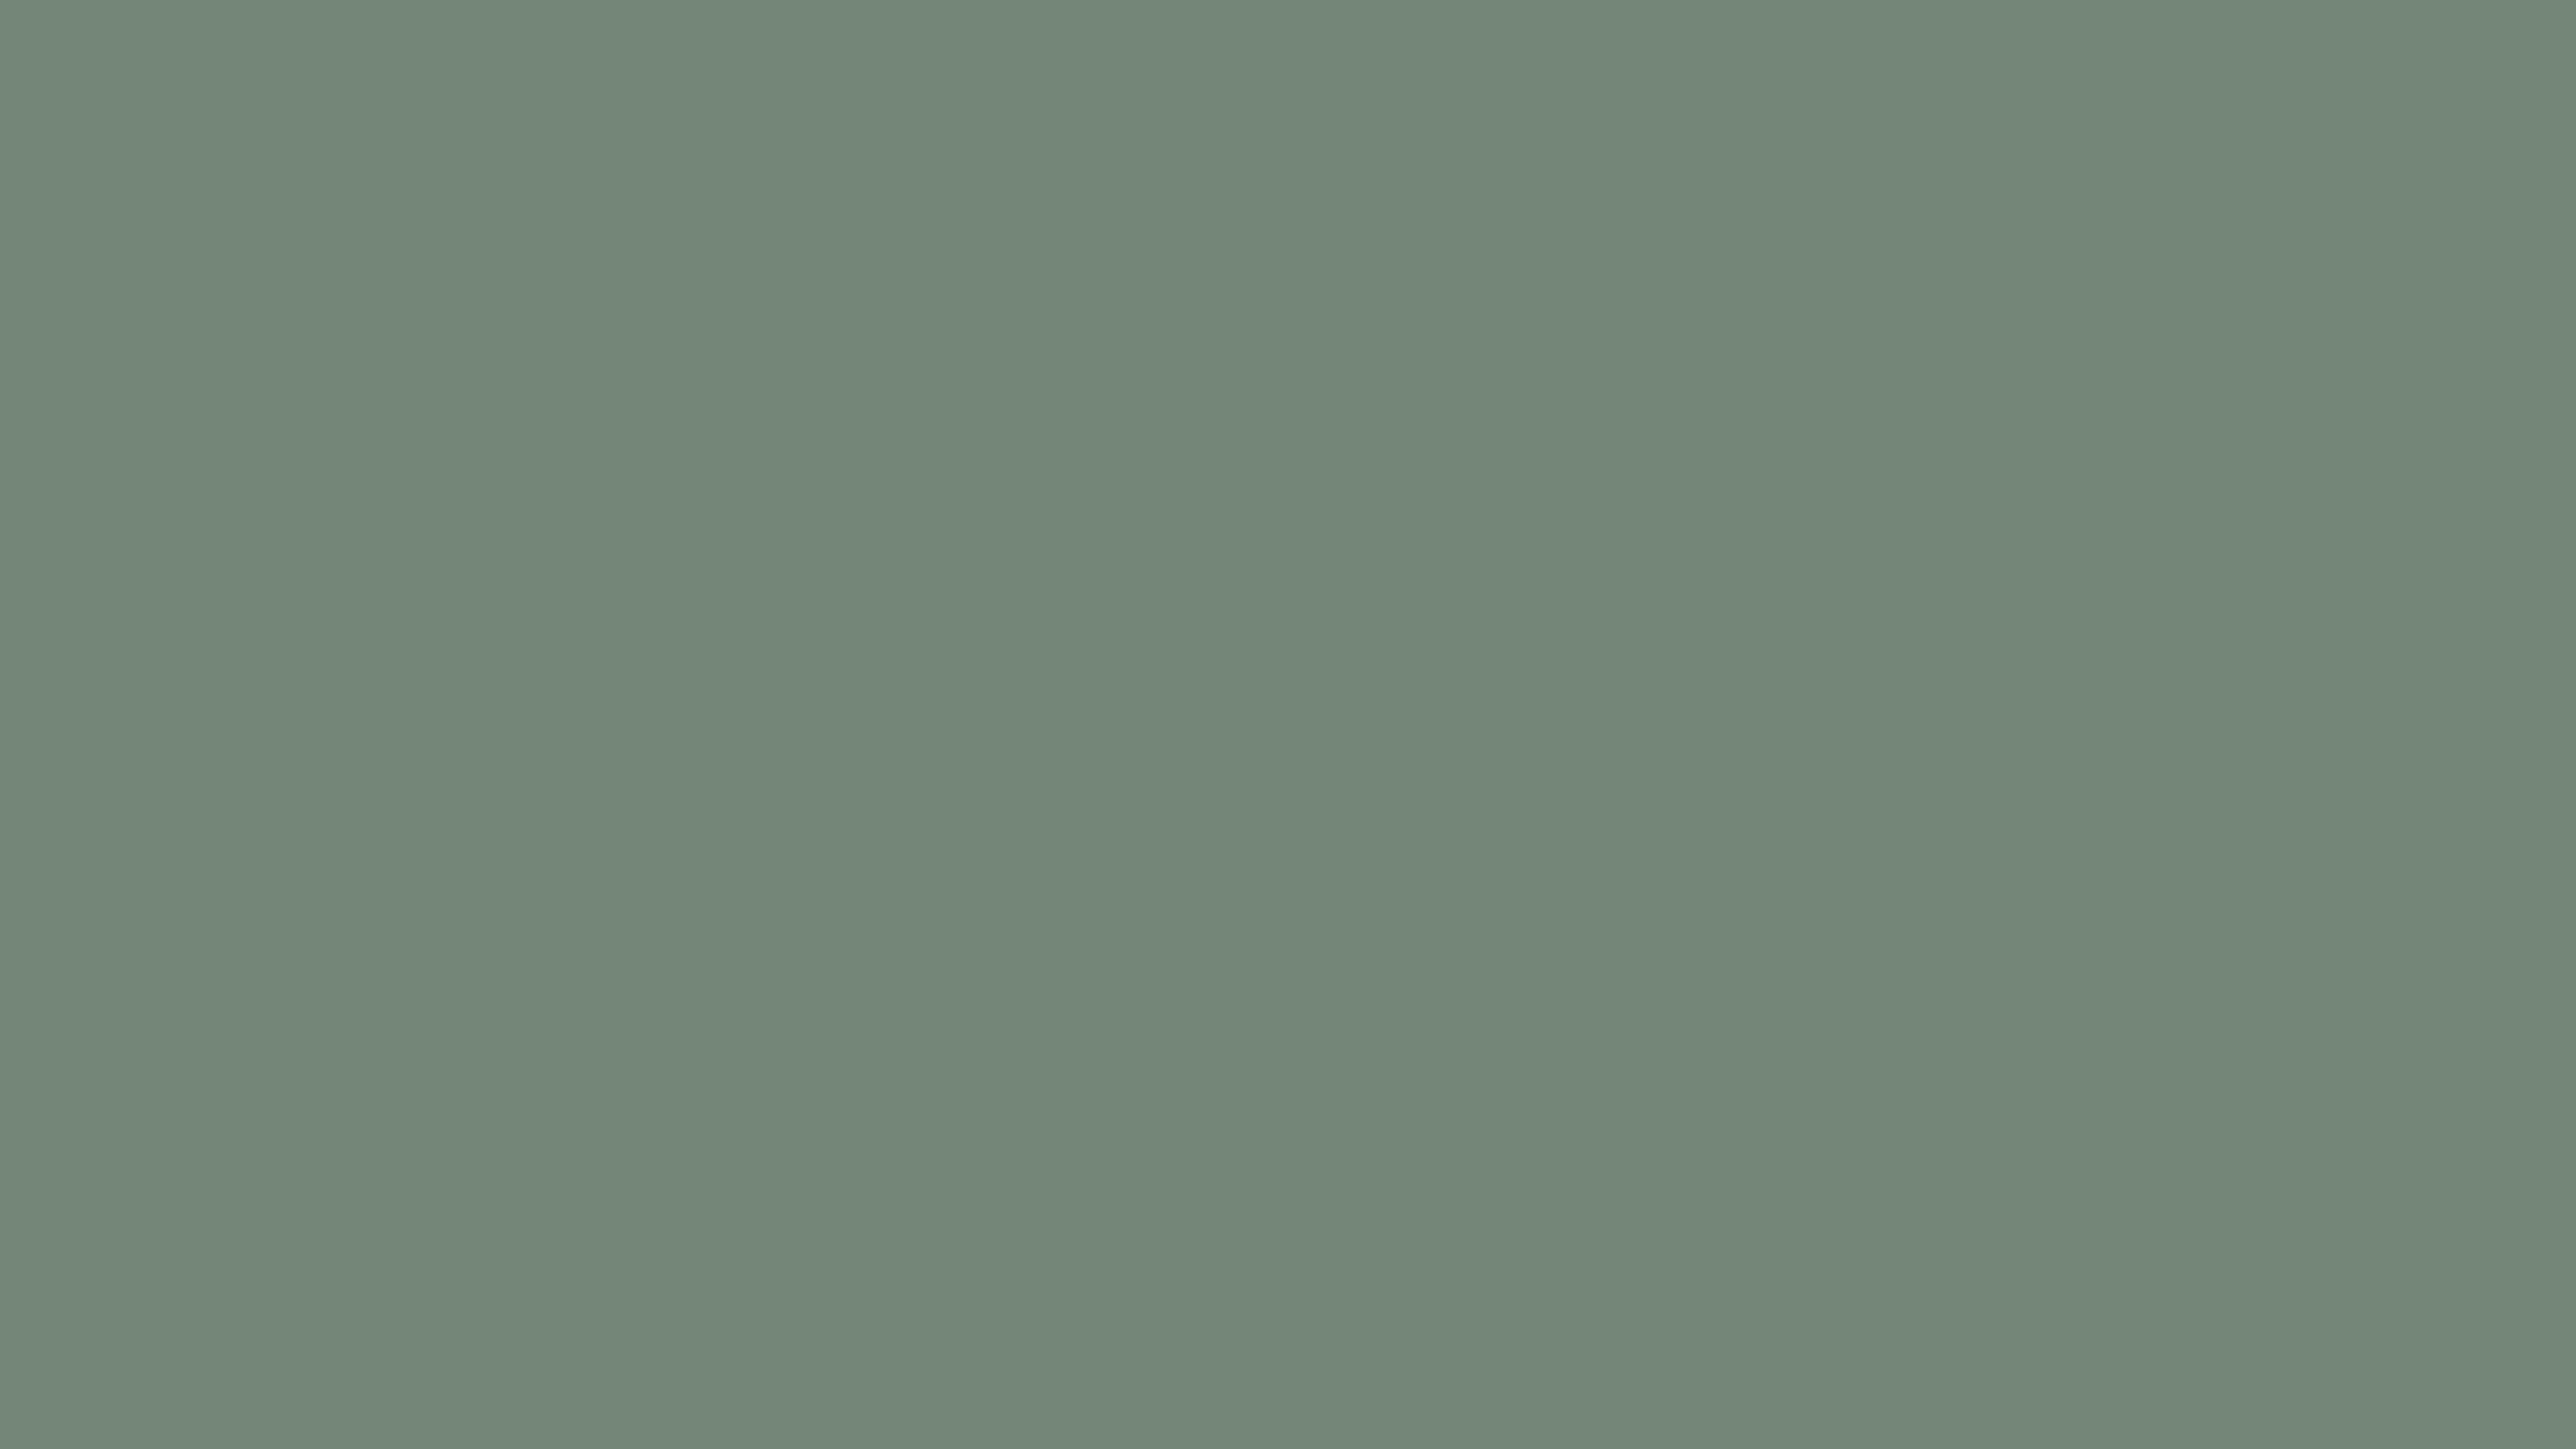 3840x2160 Xanadu Solid Color Background